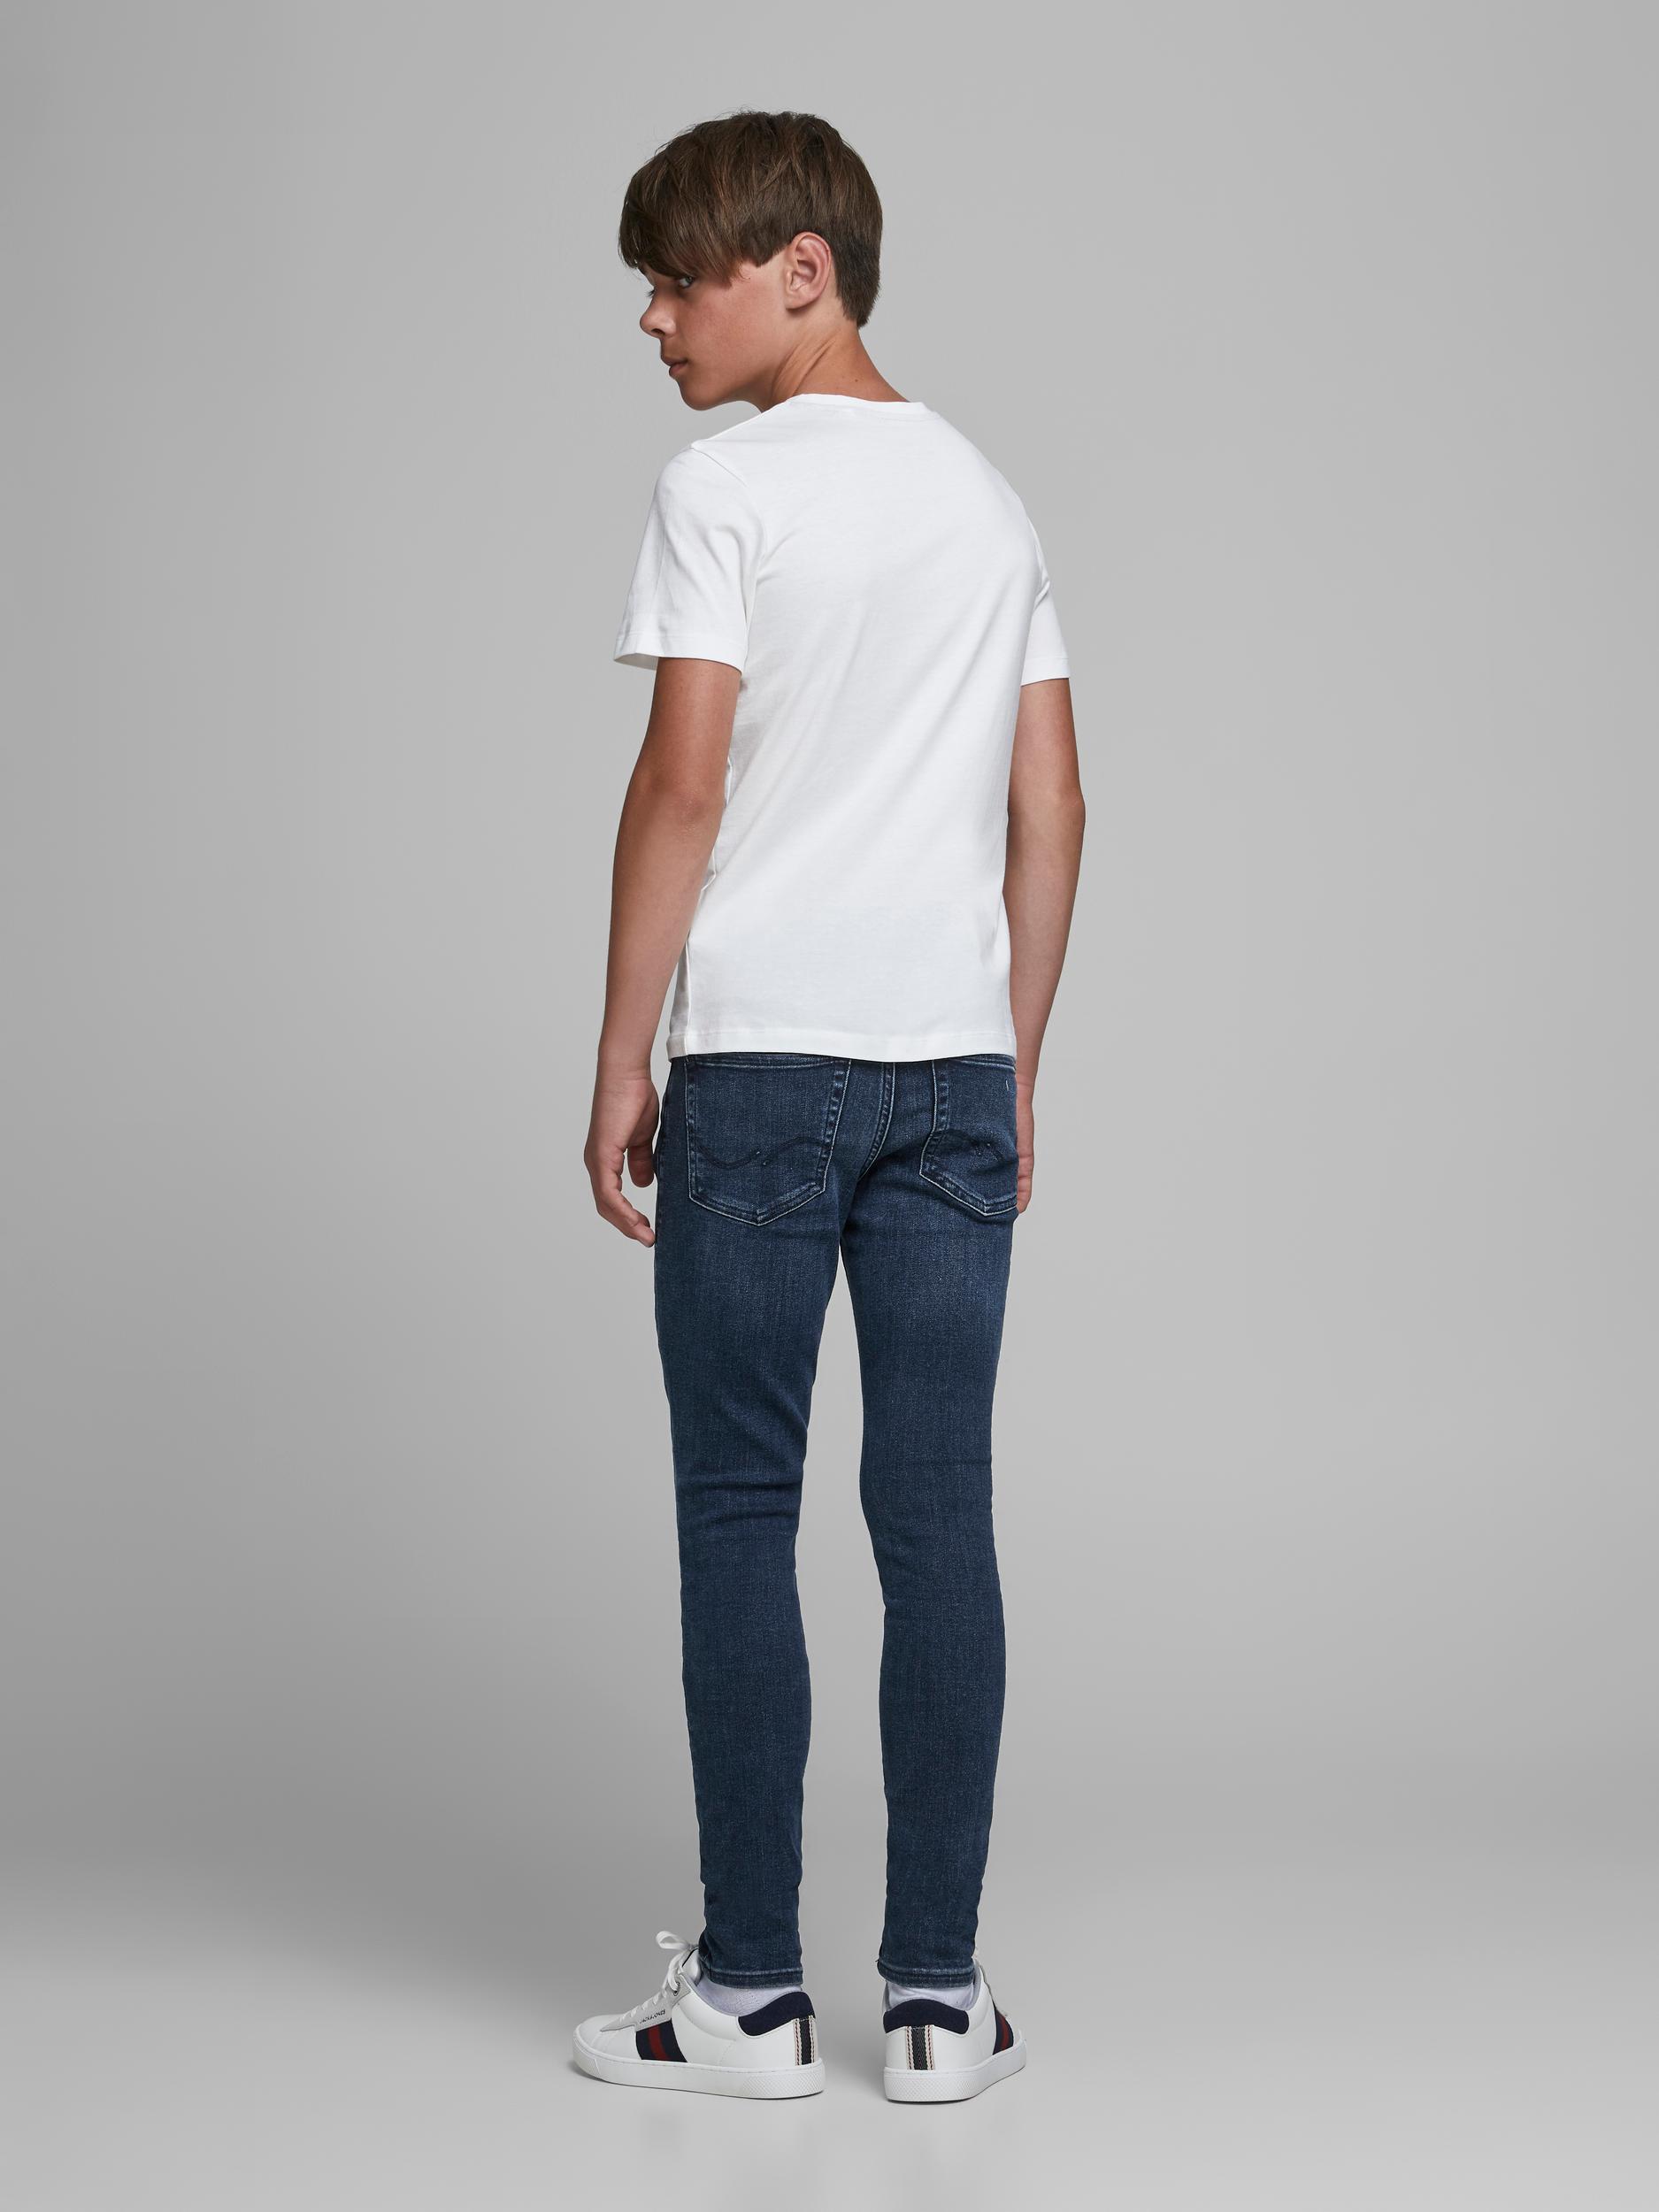 Jack & Jones Liam Original 812 jeans, blue denim, 140